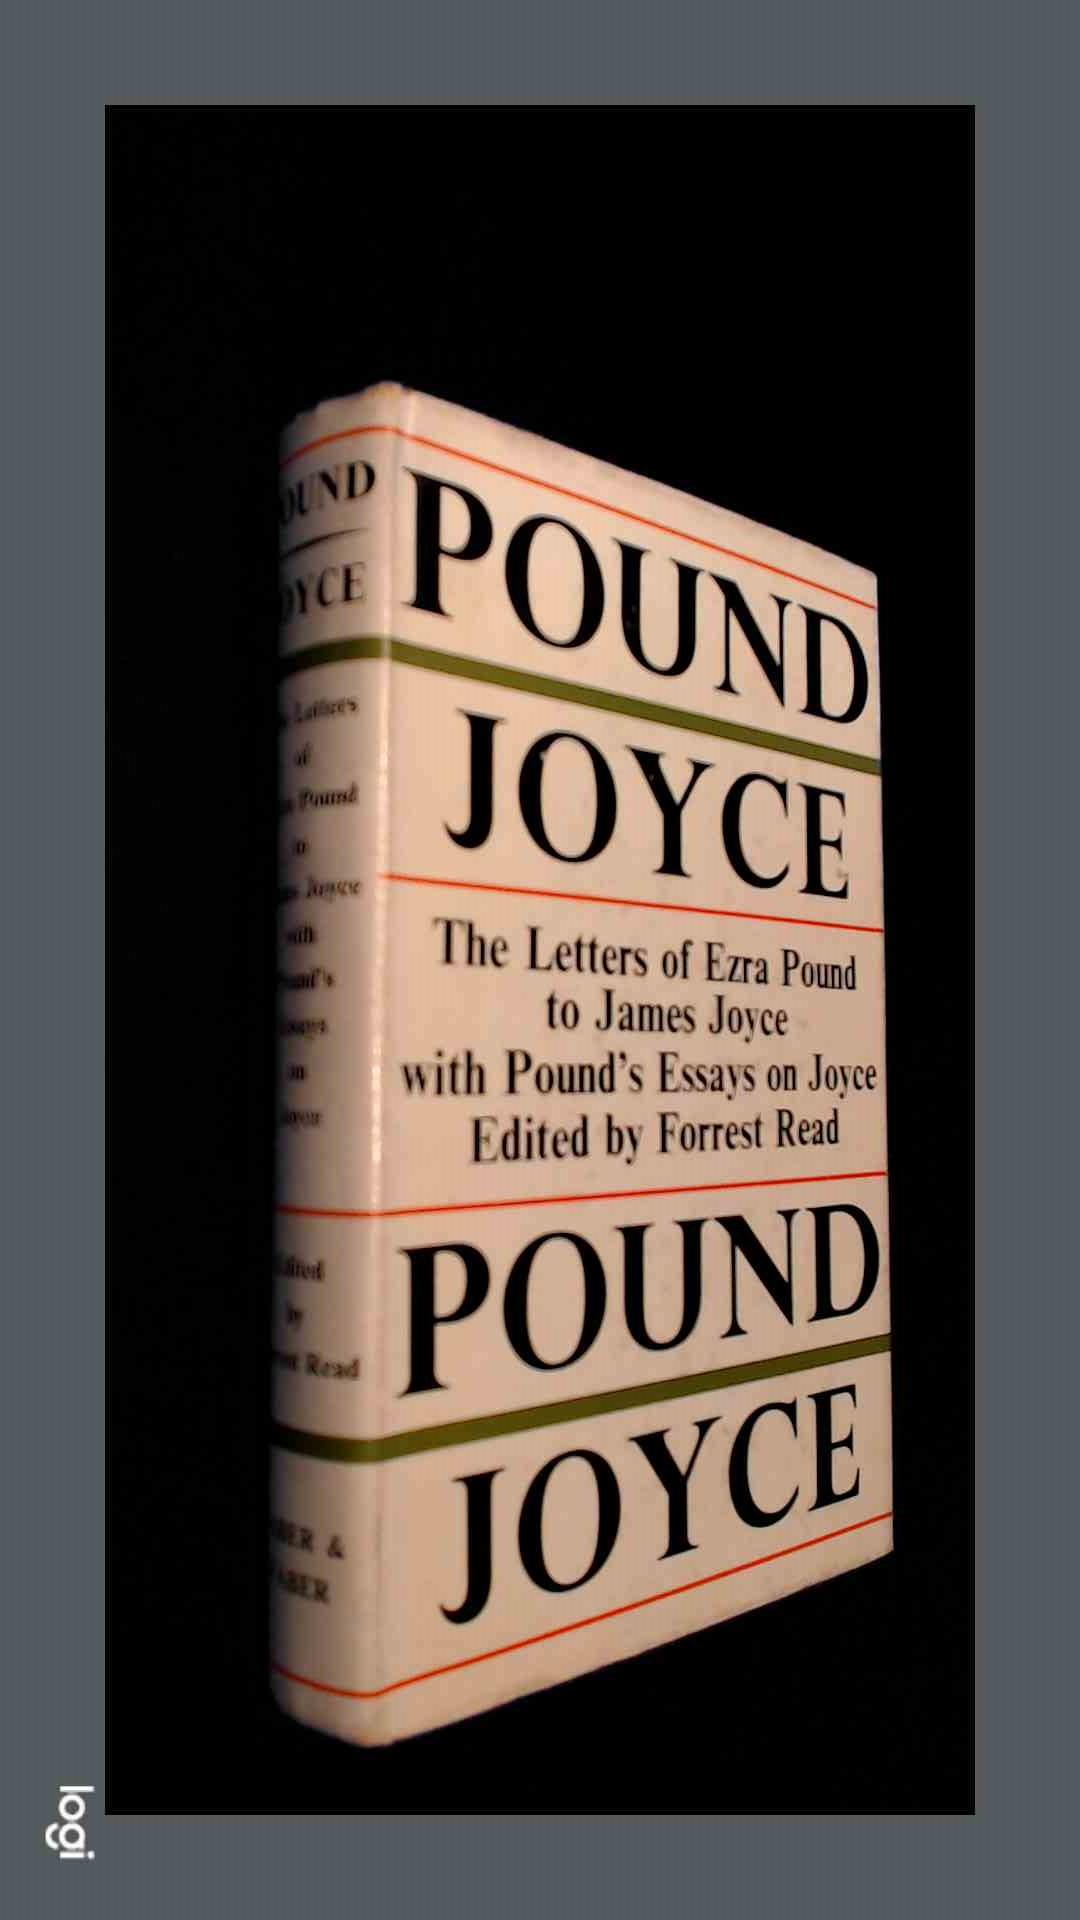 READ, FORREST - Pound / Joyce - The letters of Ezra Pound to James Joyce, with Pound's essays on Joyce